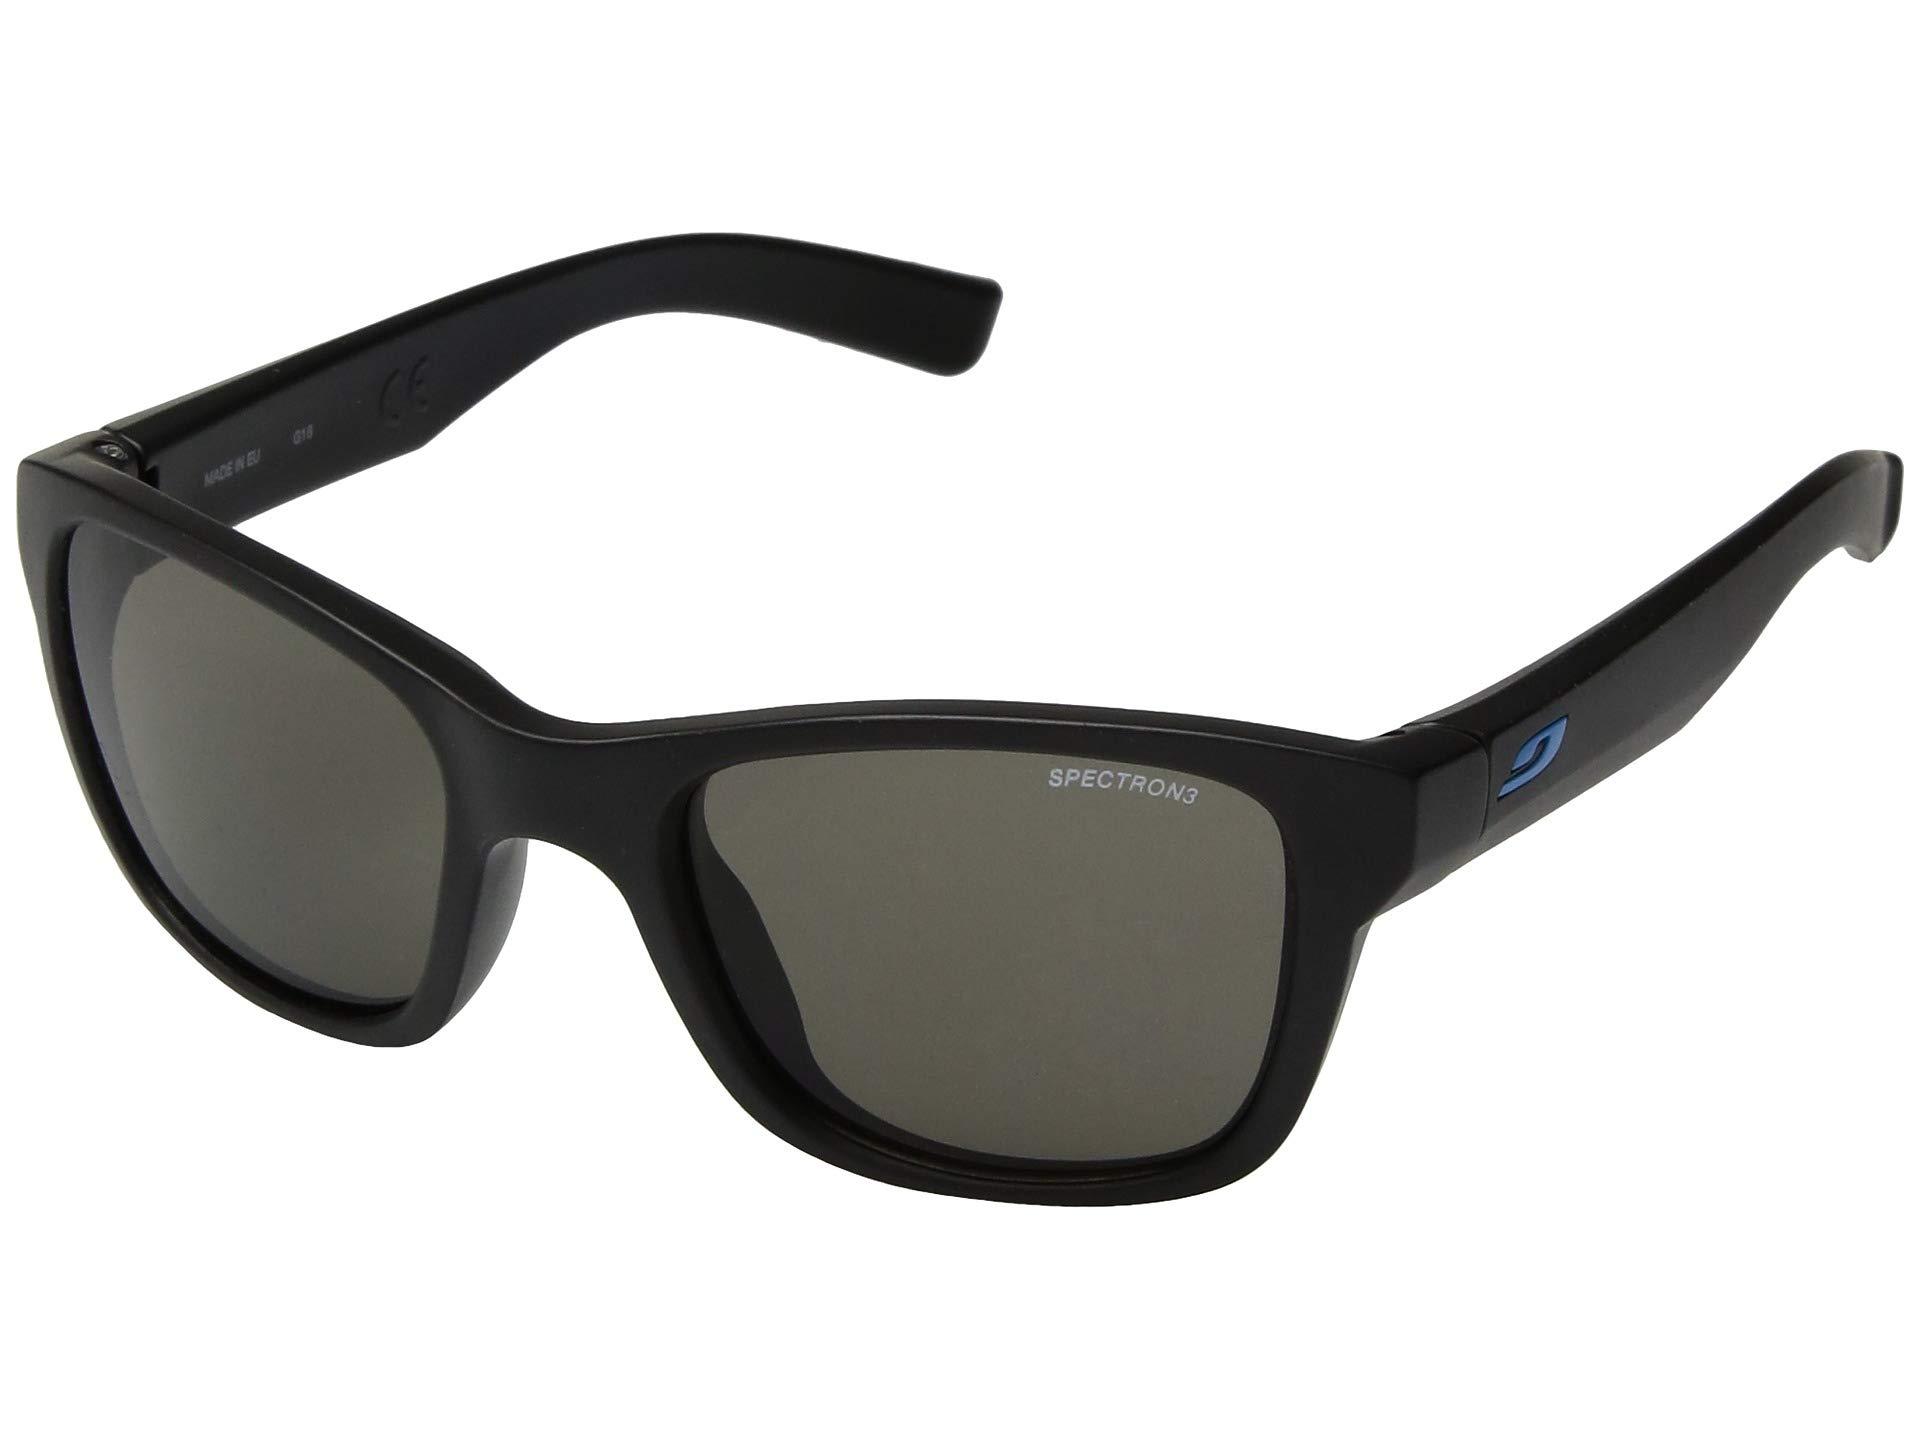 Julbo Reach Junior Sunglasses - Spectron 3 - Gray Dark/Blue